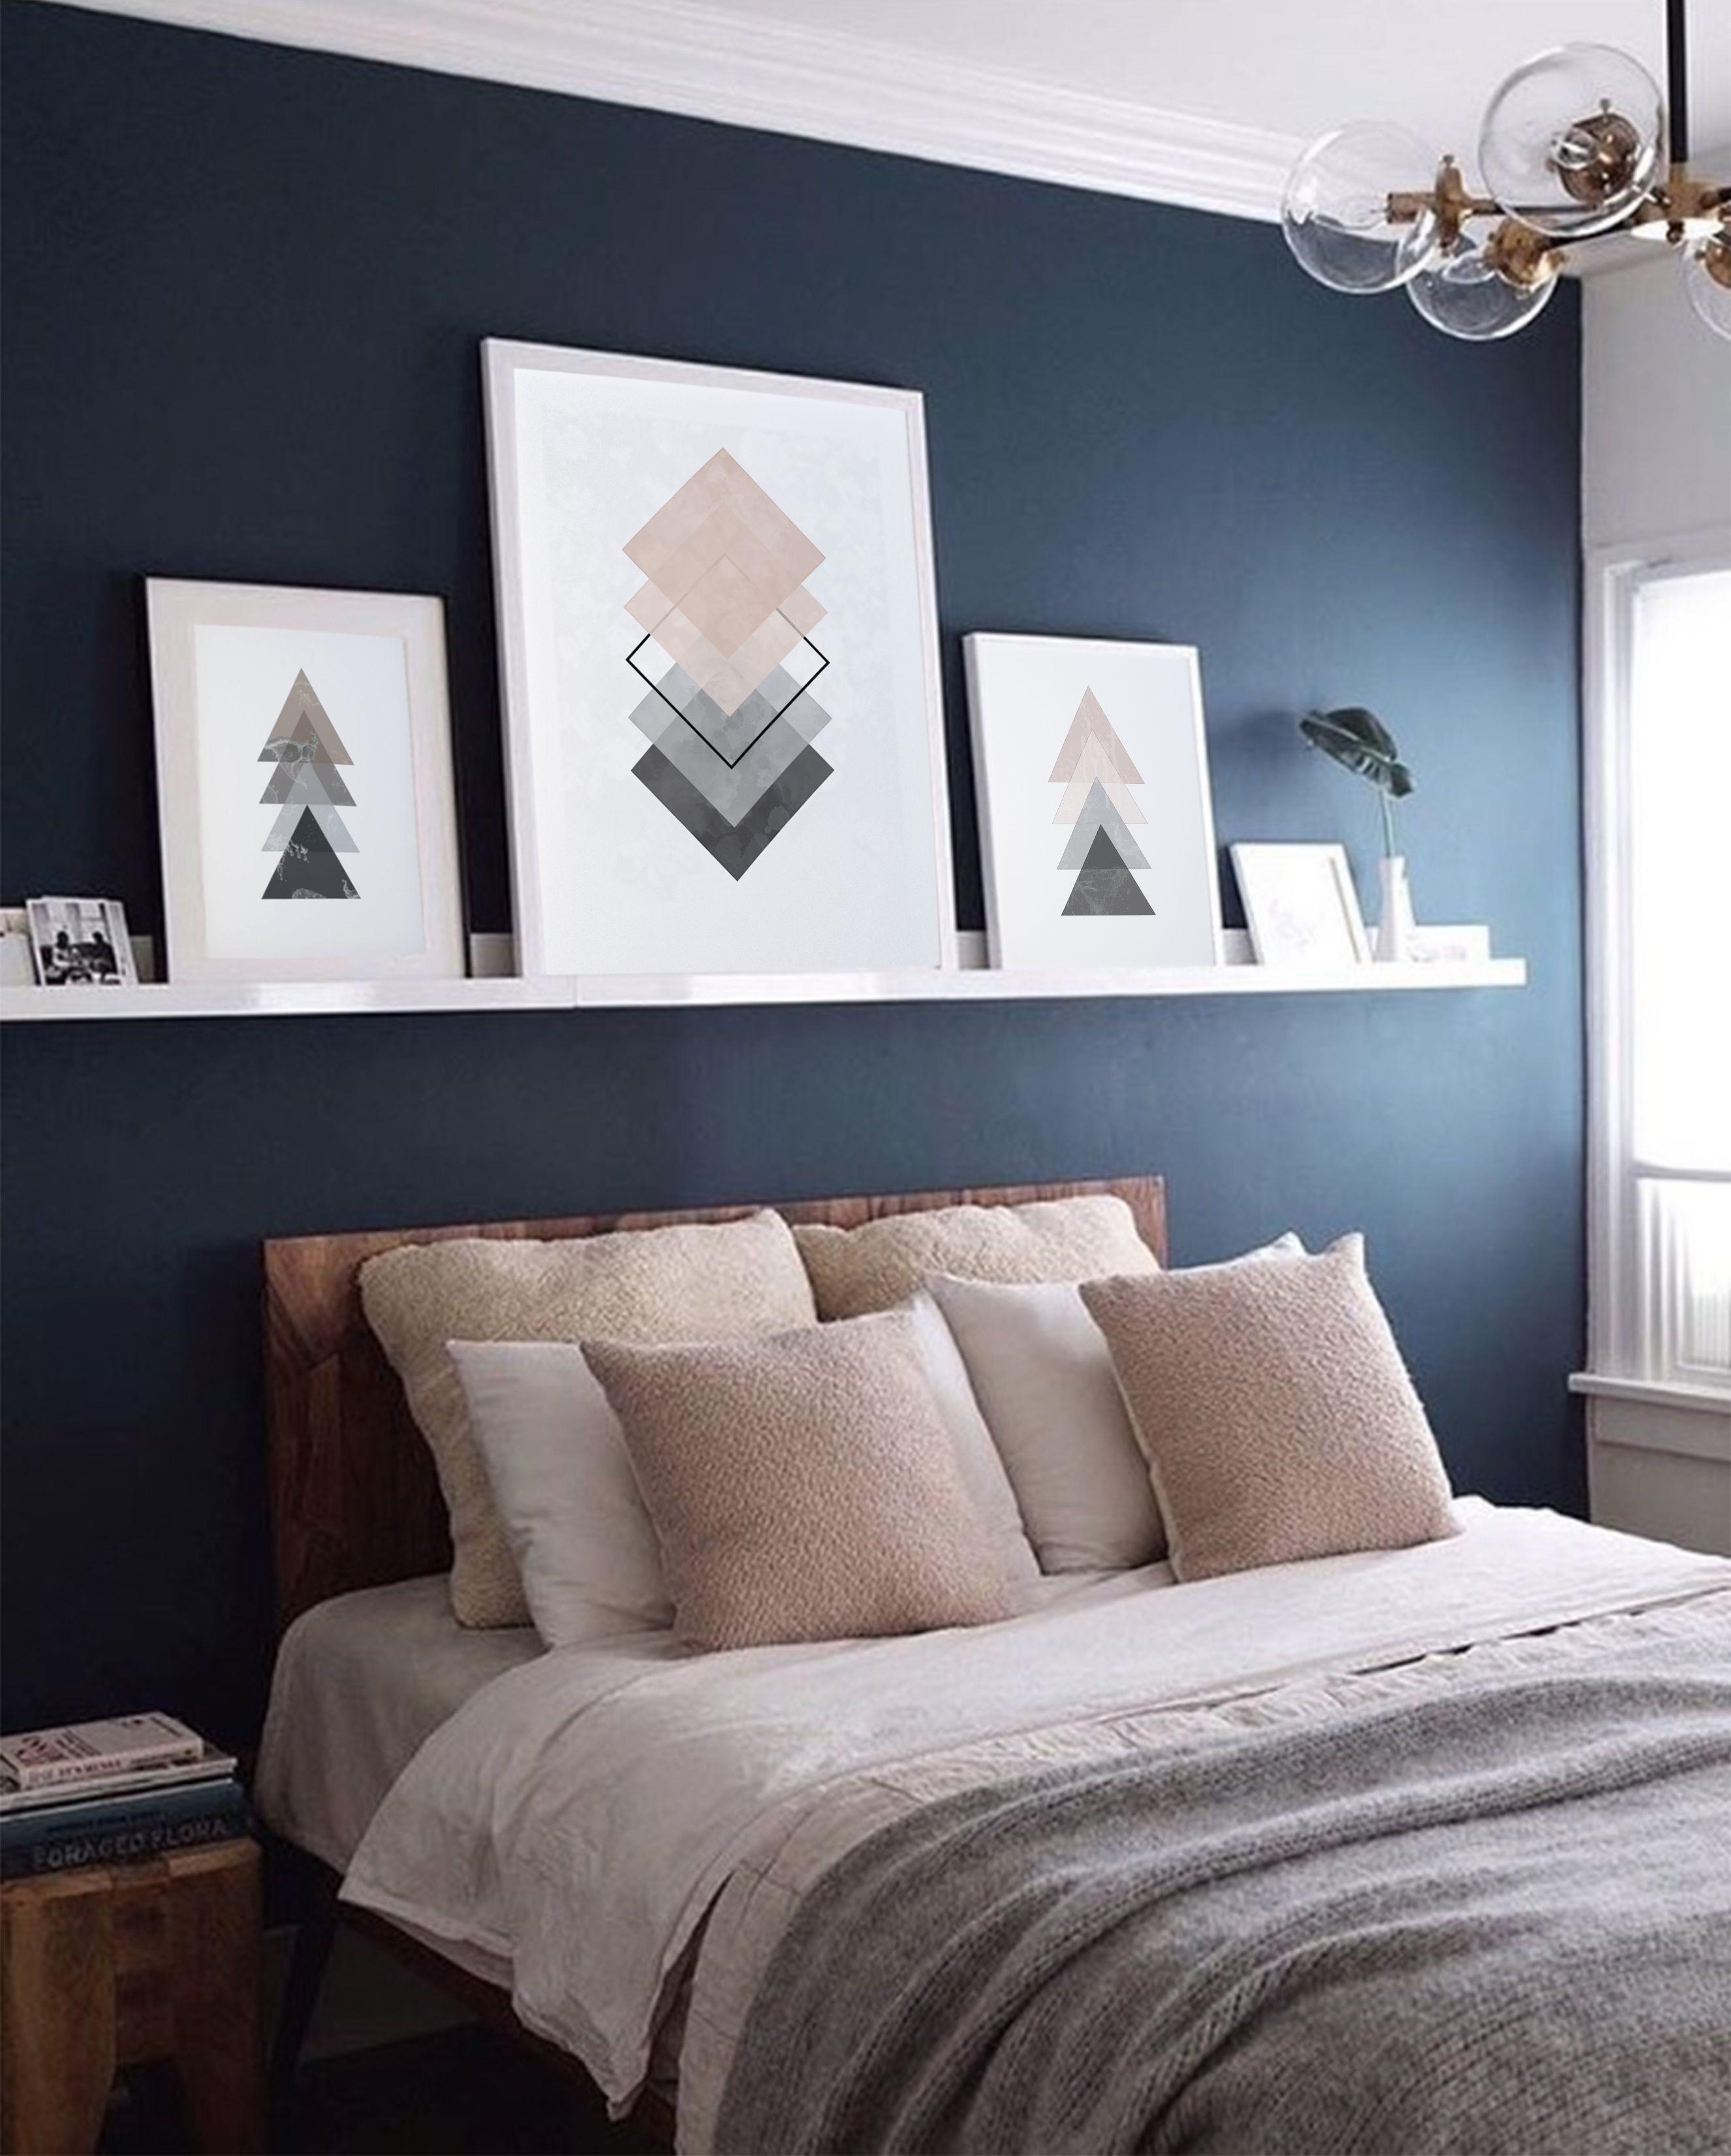 Pink Grey Geometric Art Print Geometry Art Minimalism Art Abstract Poster Set Of Three Prints Set 3 Prints Bedroom Wall Art Above Bed Blue Accent Walls Accent Wall Bedroom Accent Wall Paint Colors Minimalist blue room paint